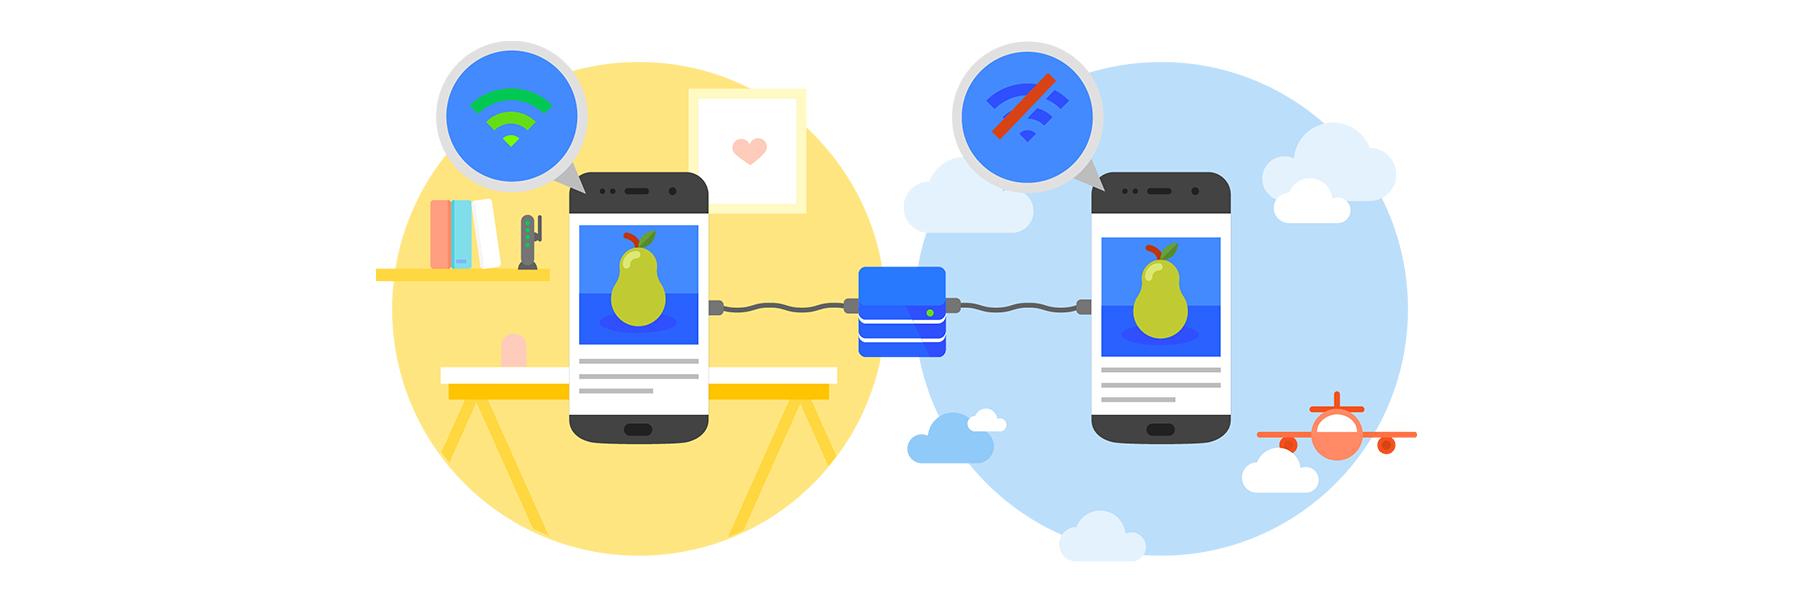 why-choose-a-progressive-web-app-for-web-development